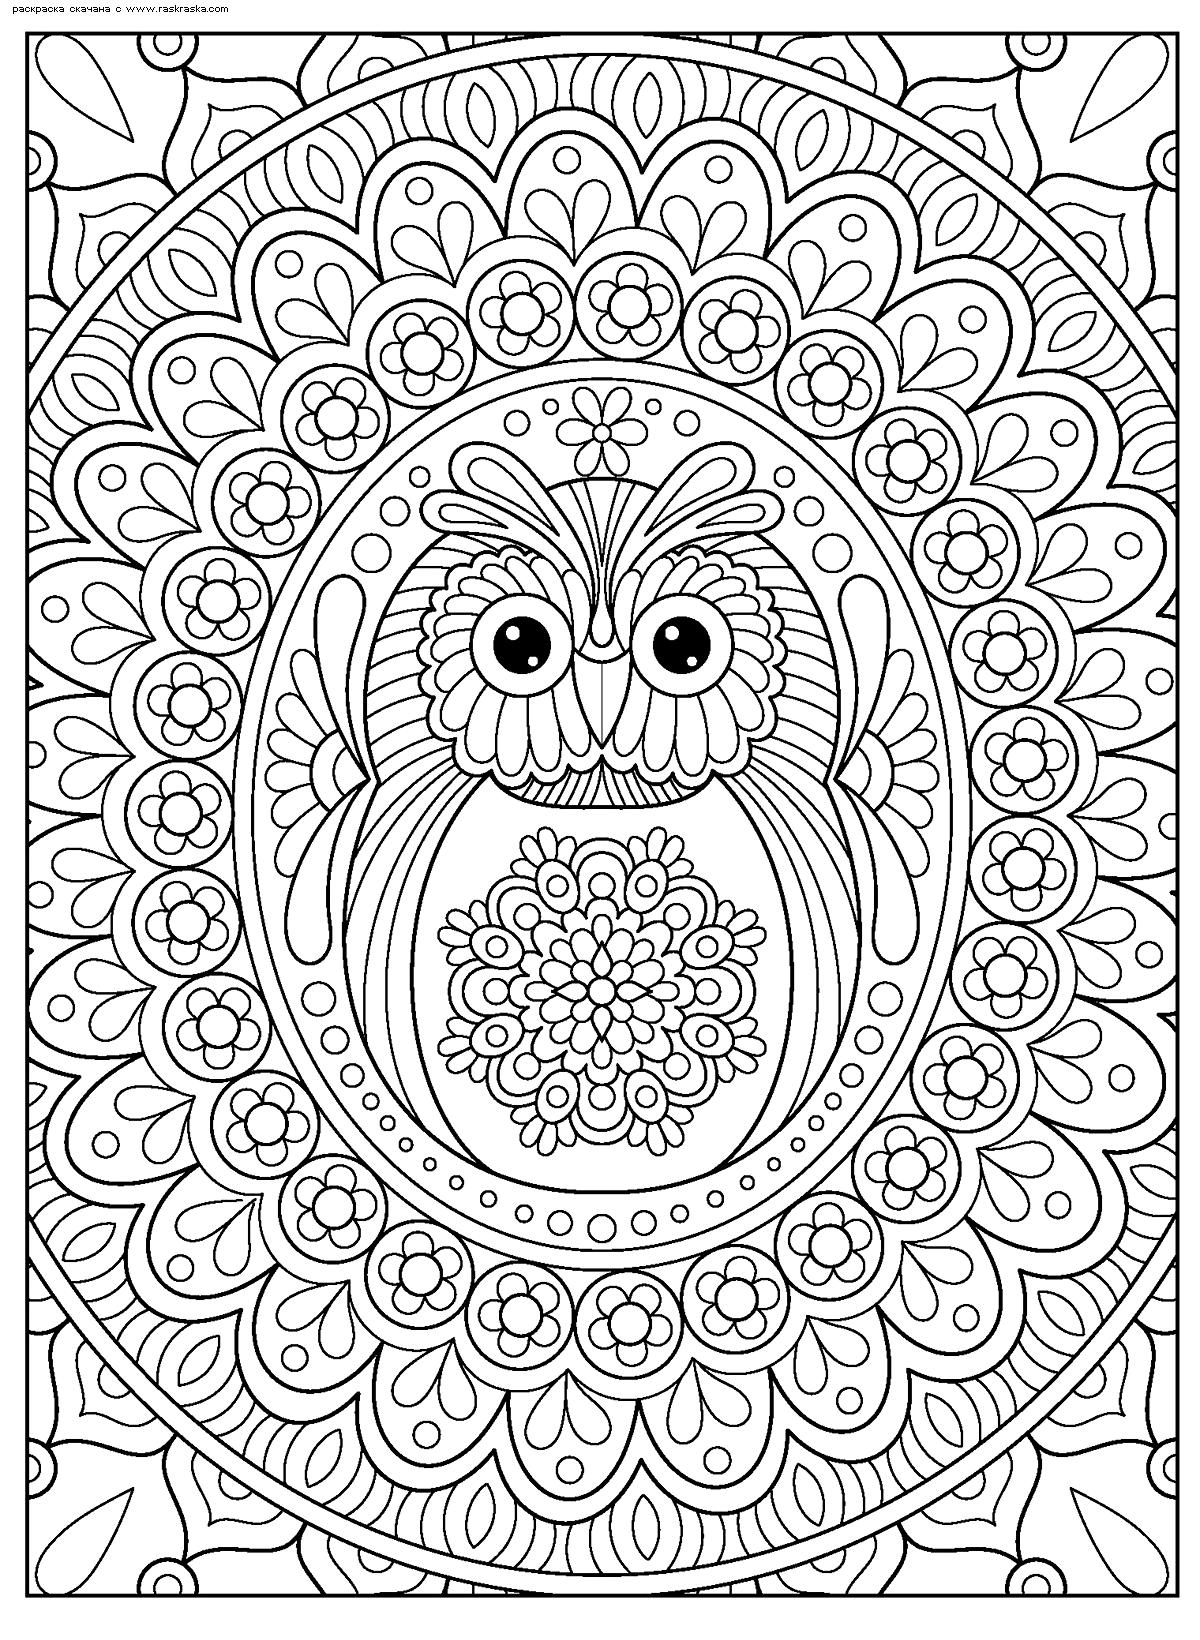 Раскраска Совенок. Раскраска сова, антистресс